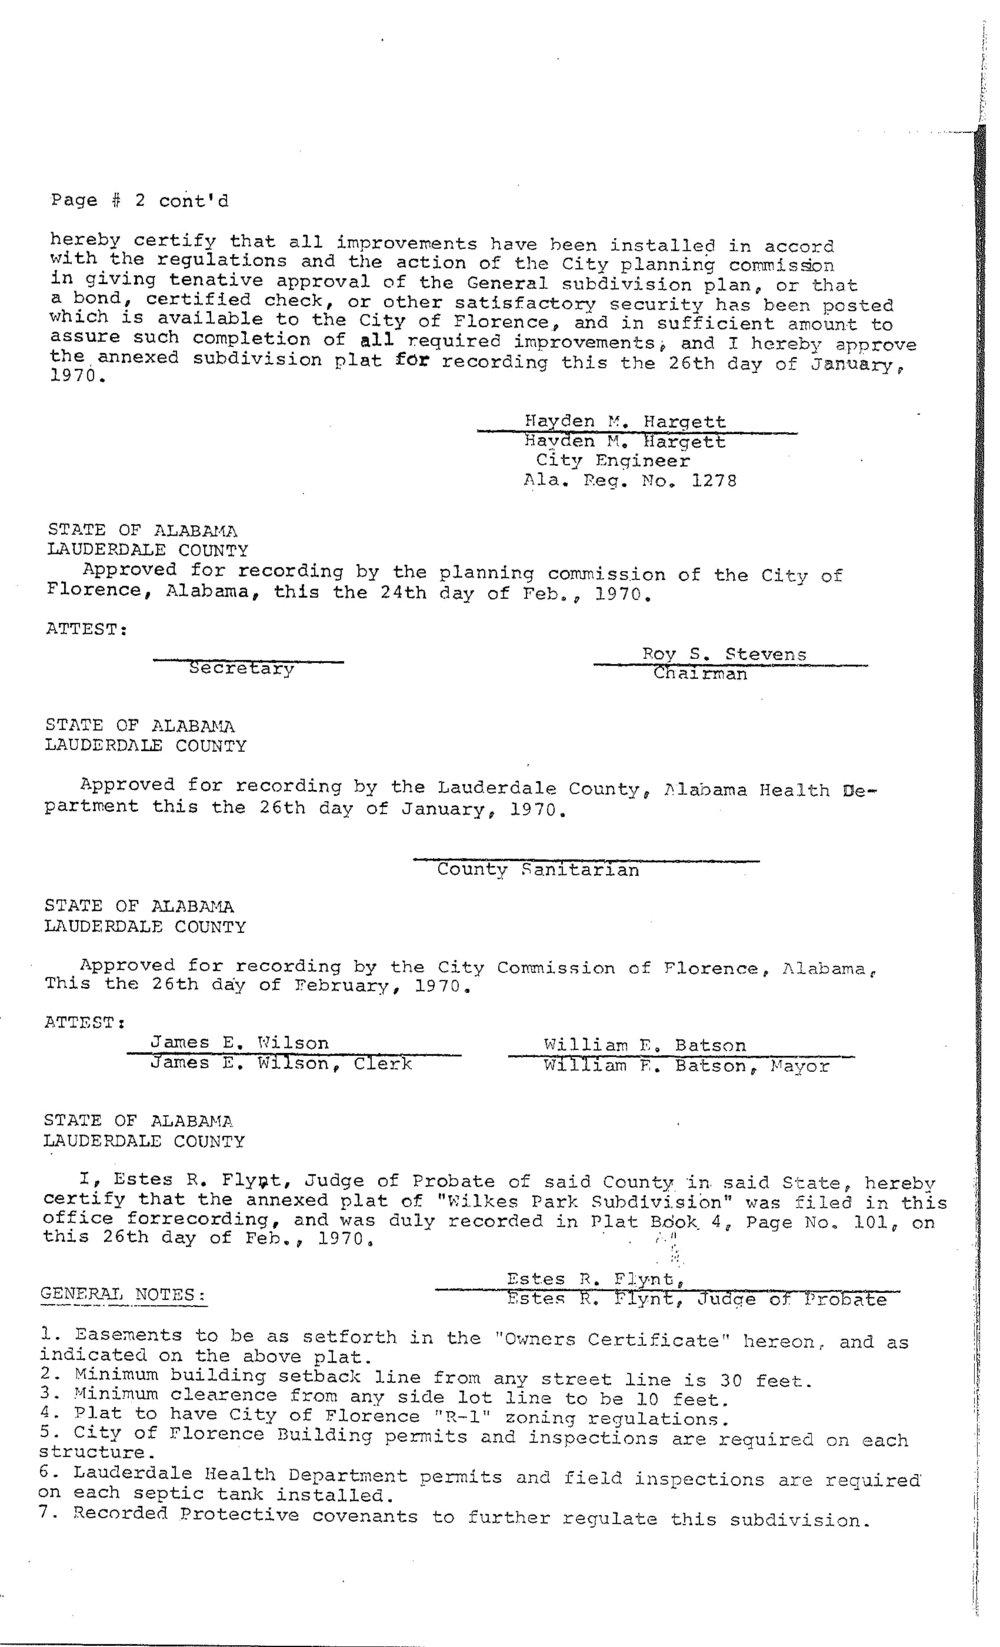 Covenants-Wilkes-Park-Subdivision-2.jpg